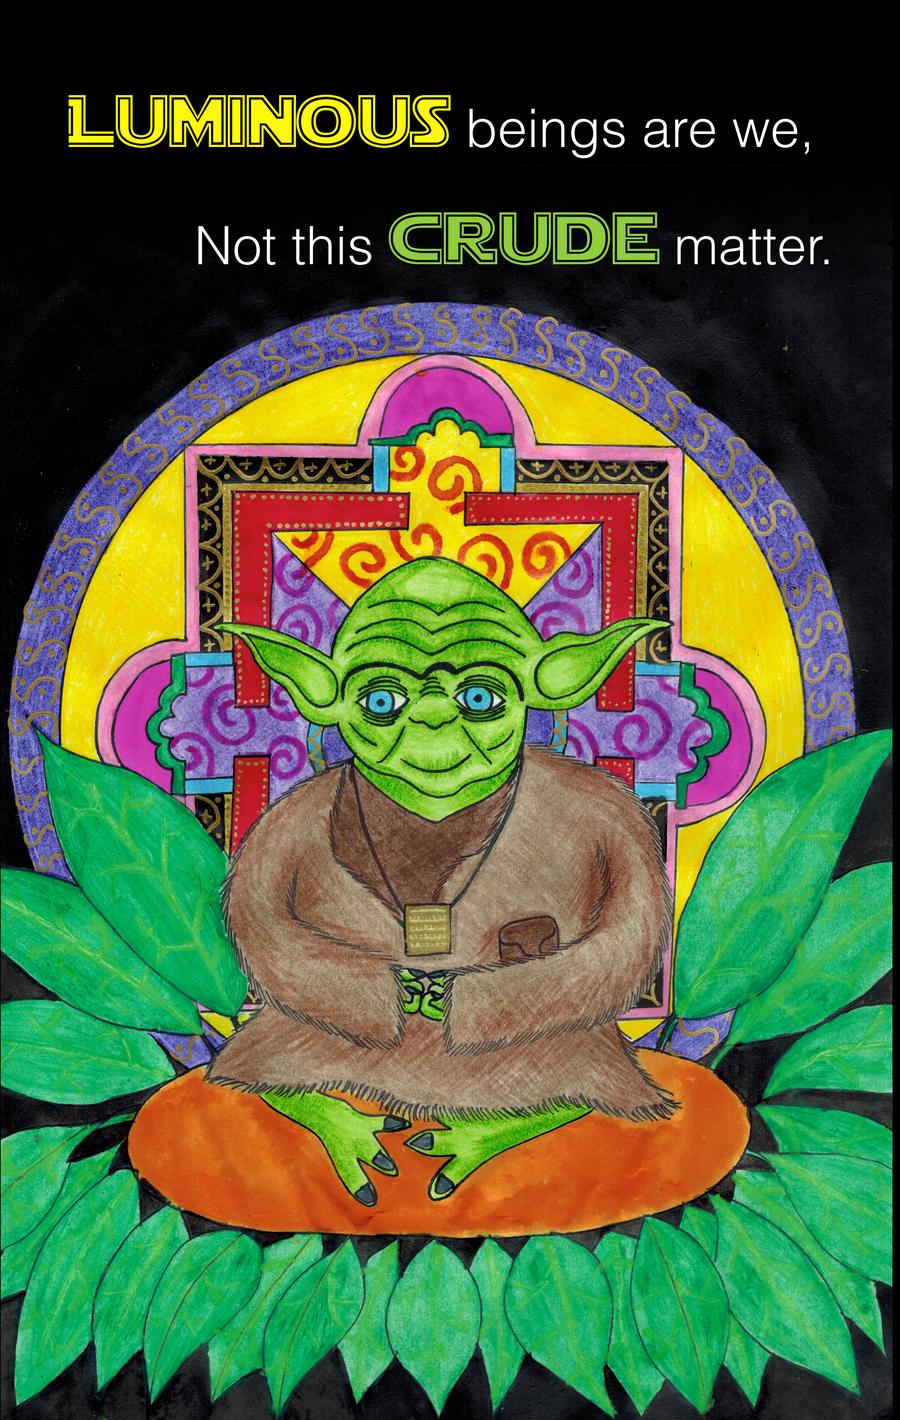 Yoda Buddha by supersams89